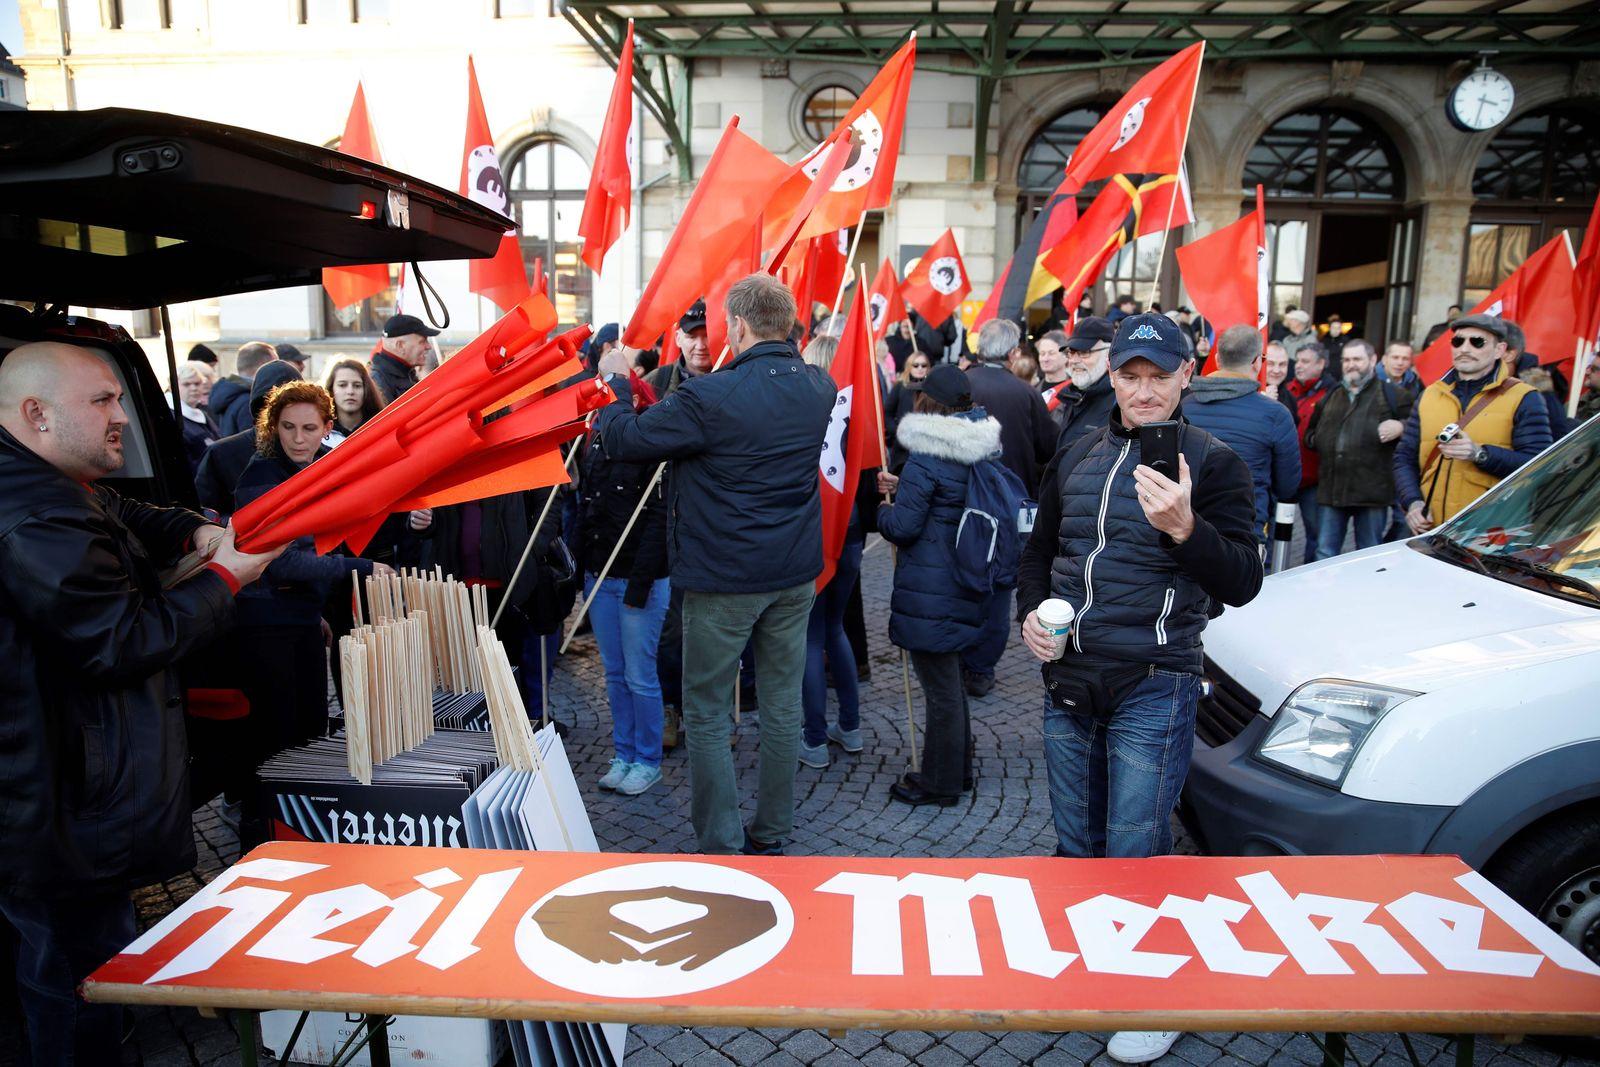 Chemnitz/ Demonstration/ Angela Merkel/ Heil Merkel Plakat